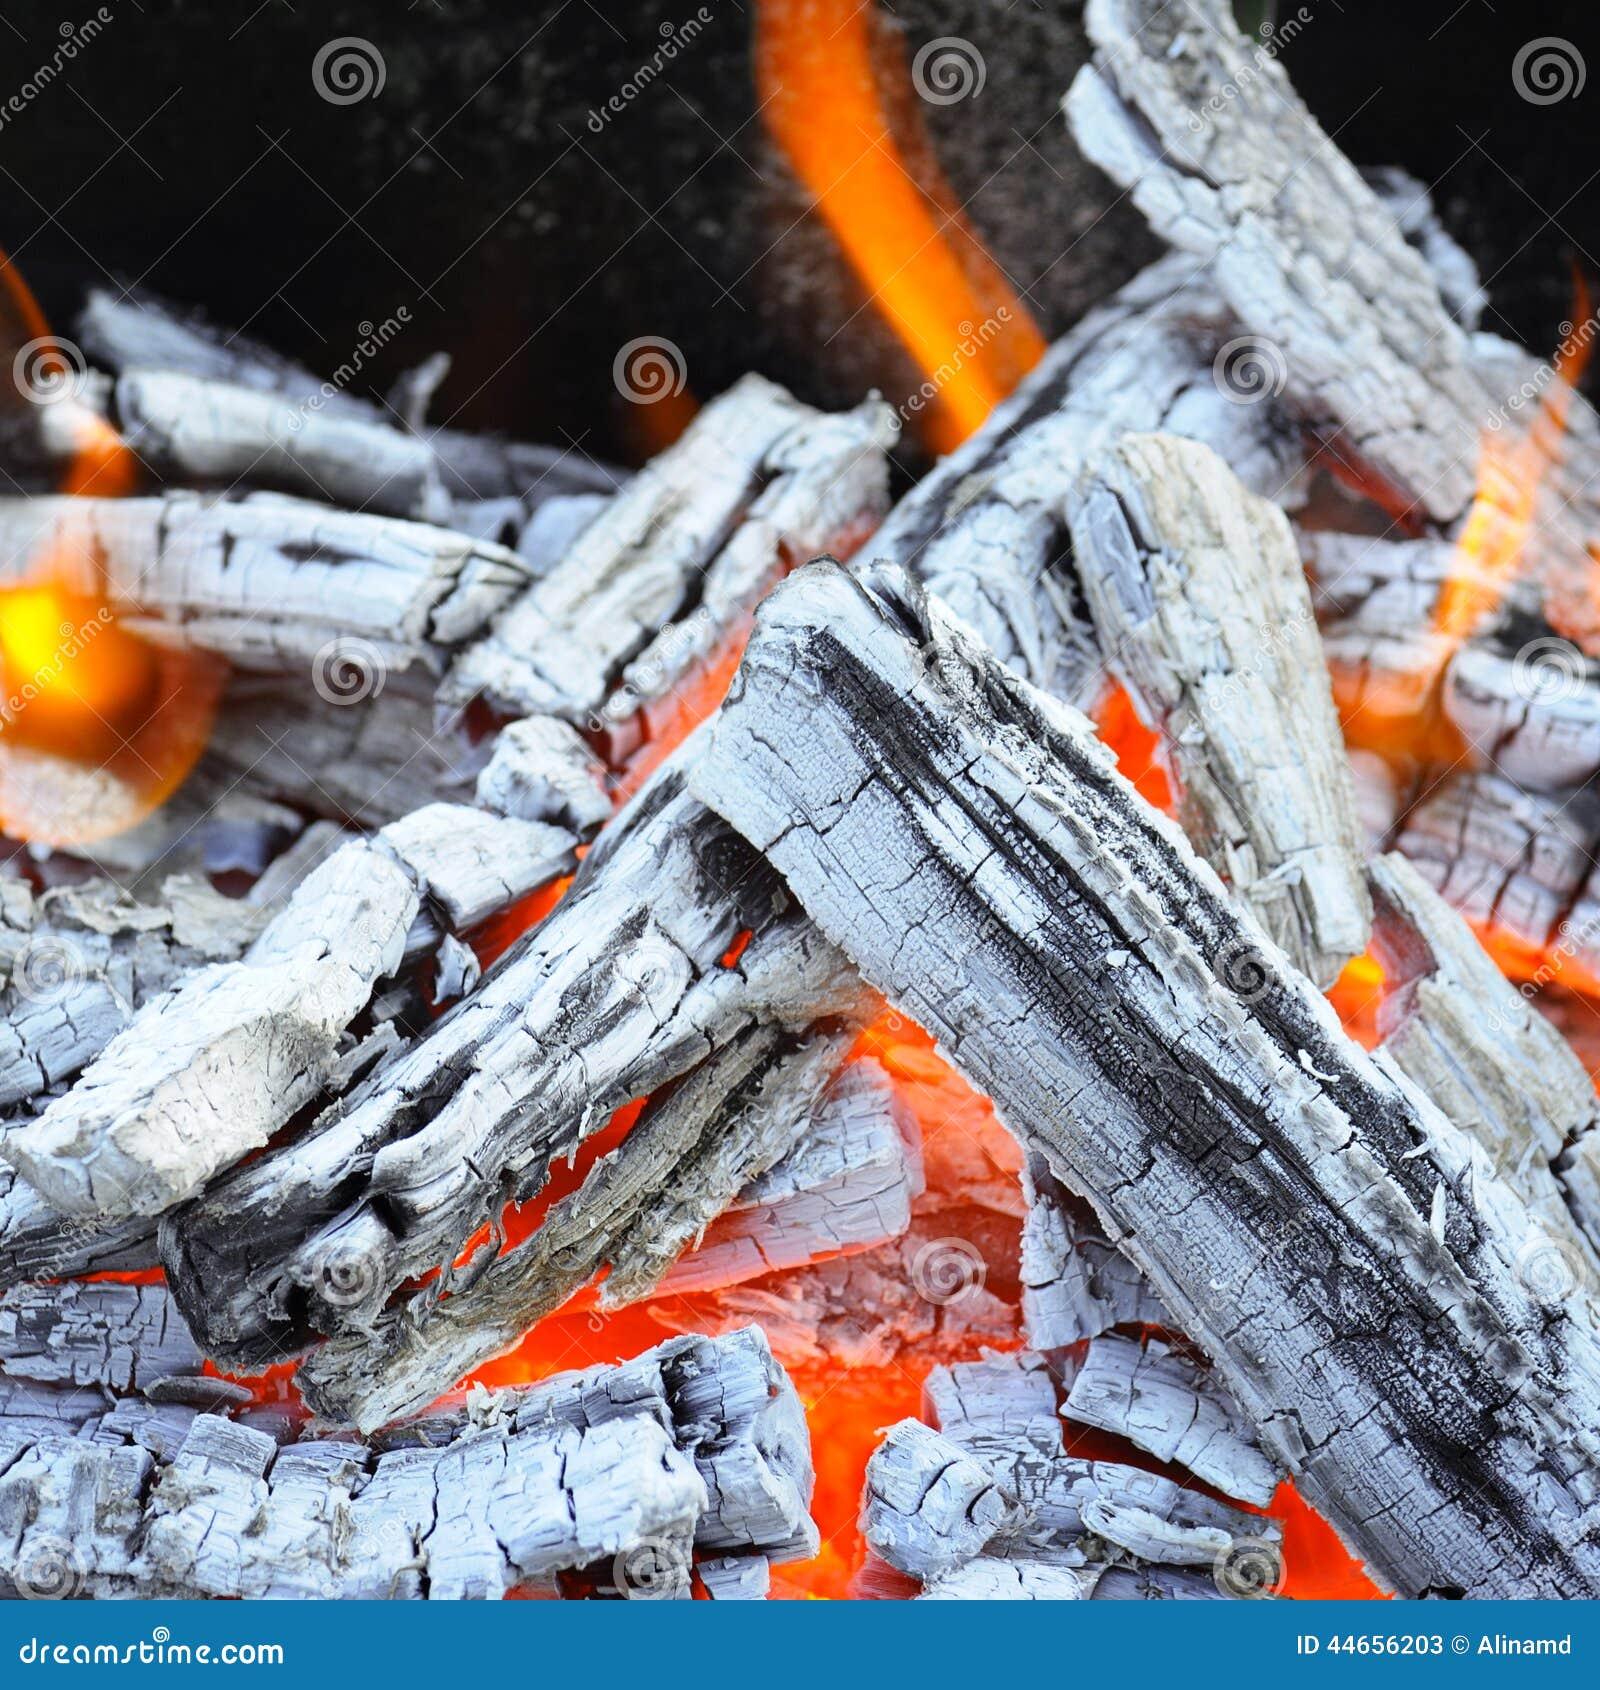 Bonfire and wood coal